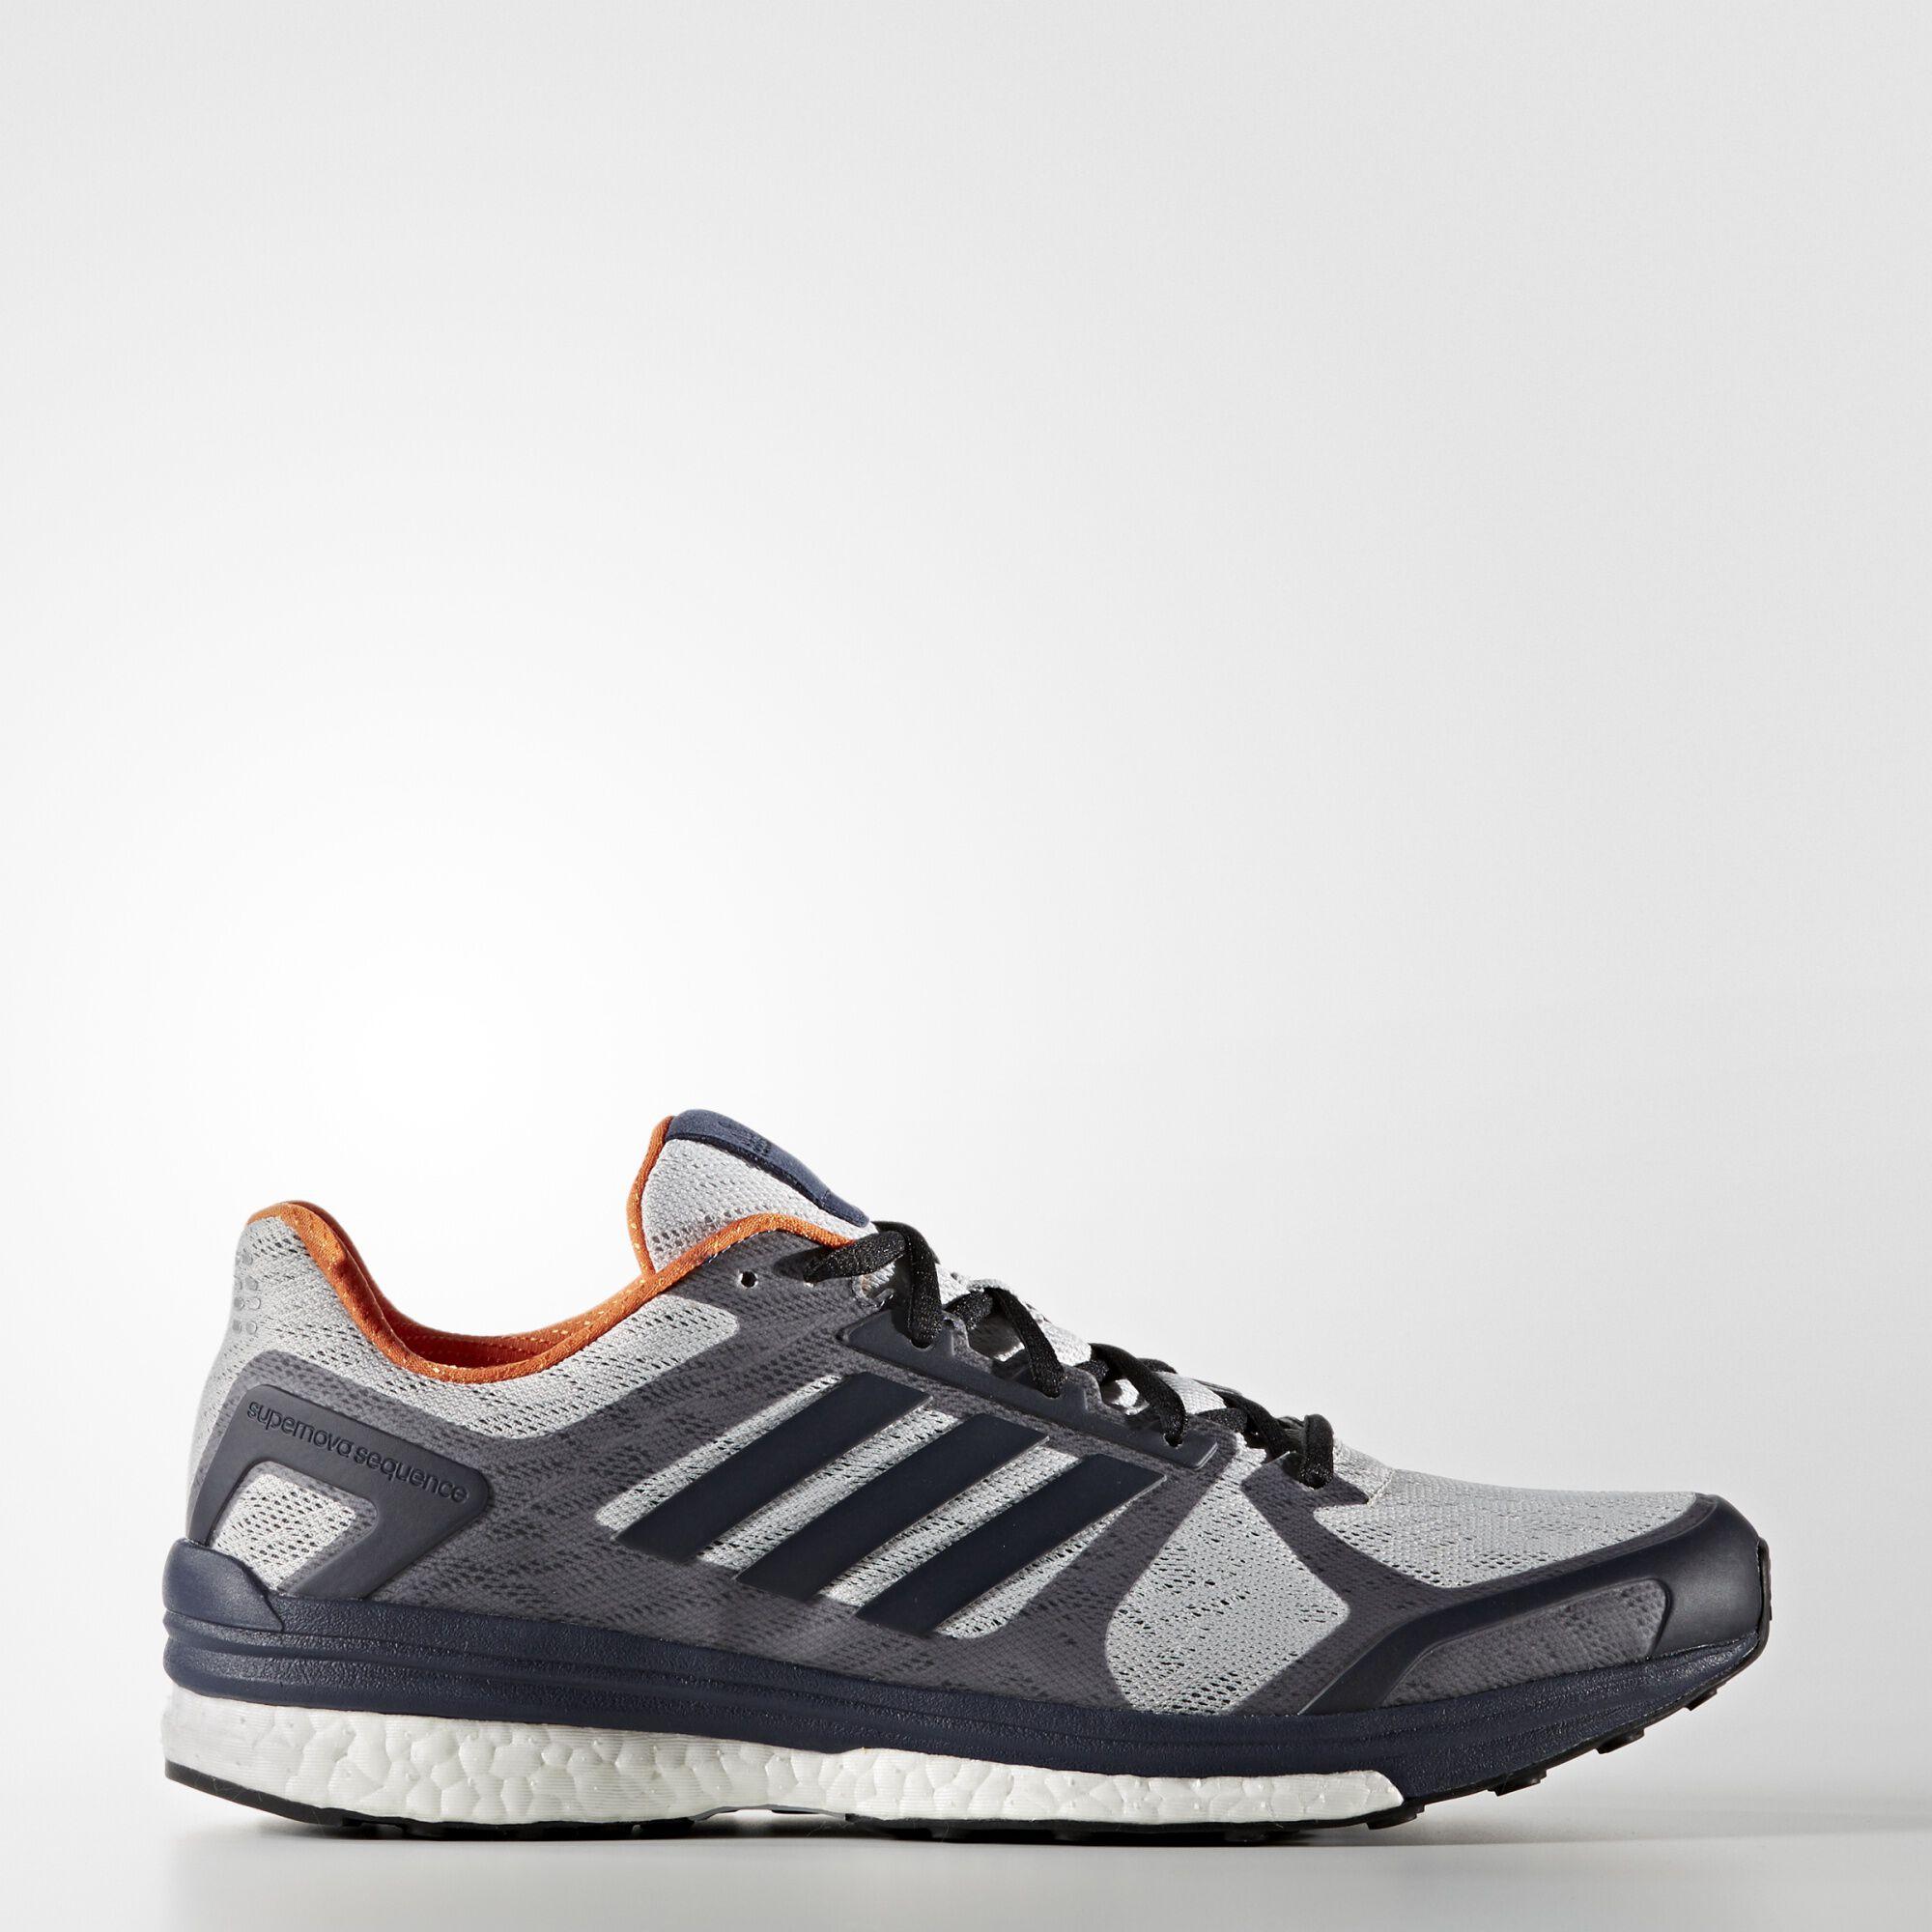 adidas supernova sequence 9 shoes grey adidas us. Black Bedroom Furniture Sets. Home Design Ideas